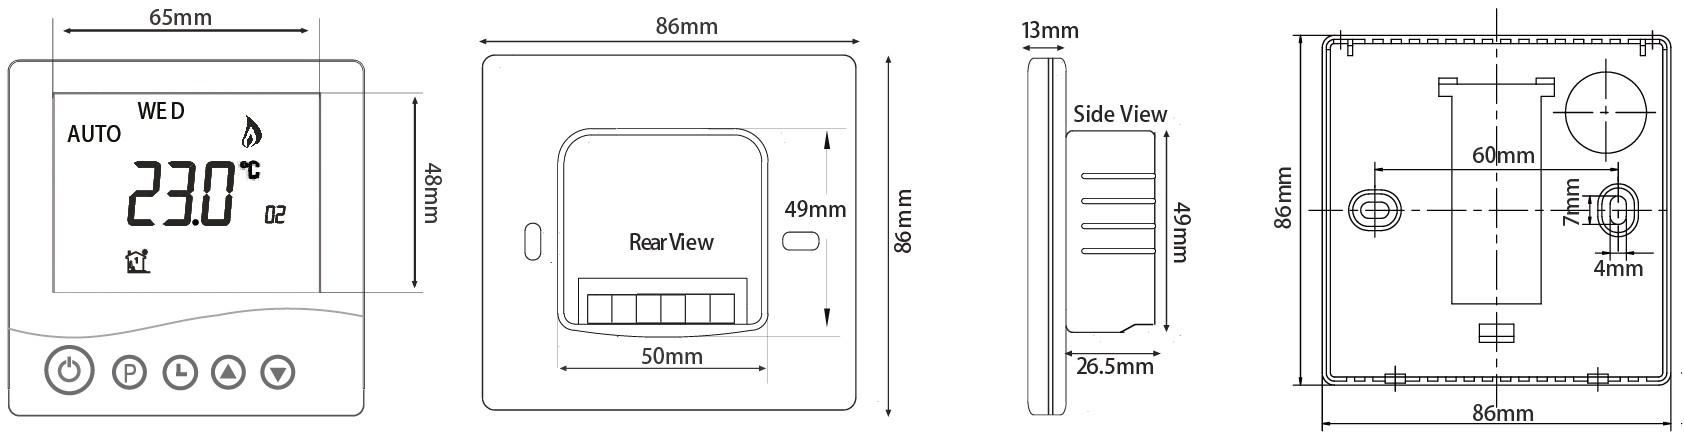 Tr3500 Dimensions